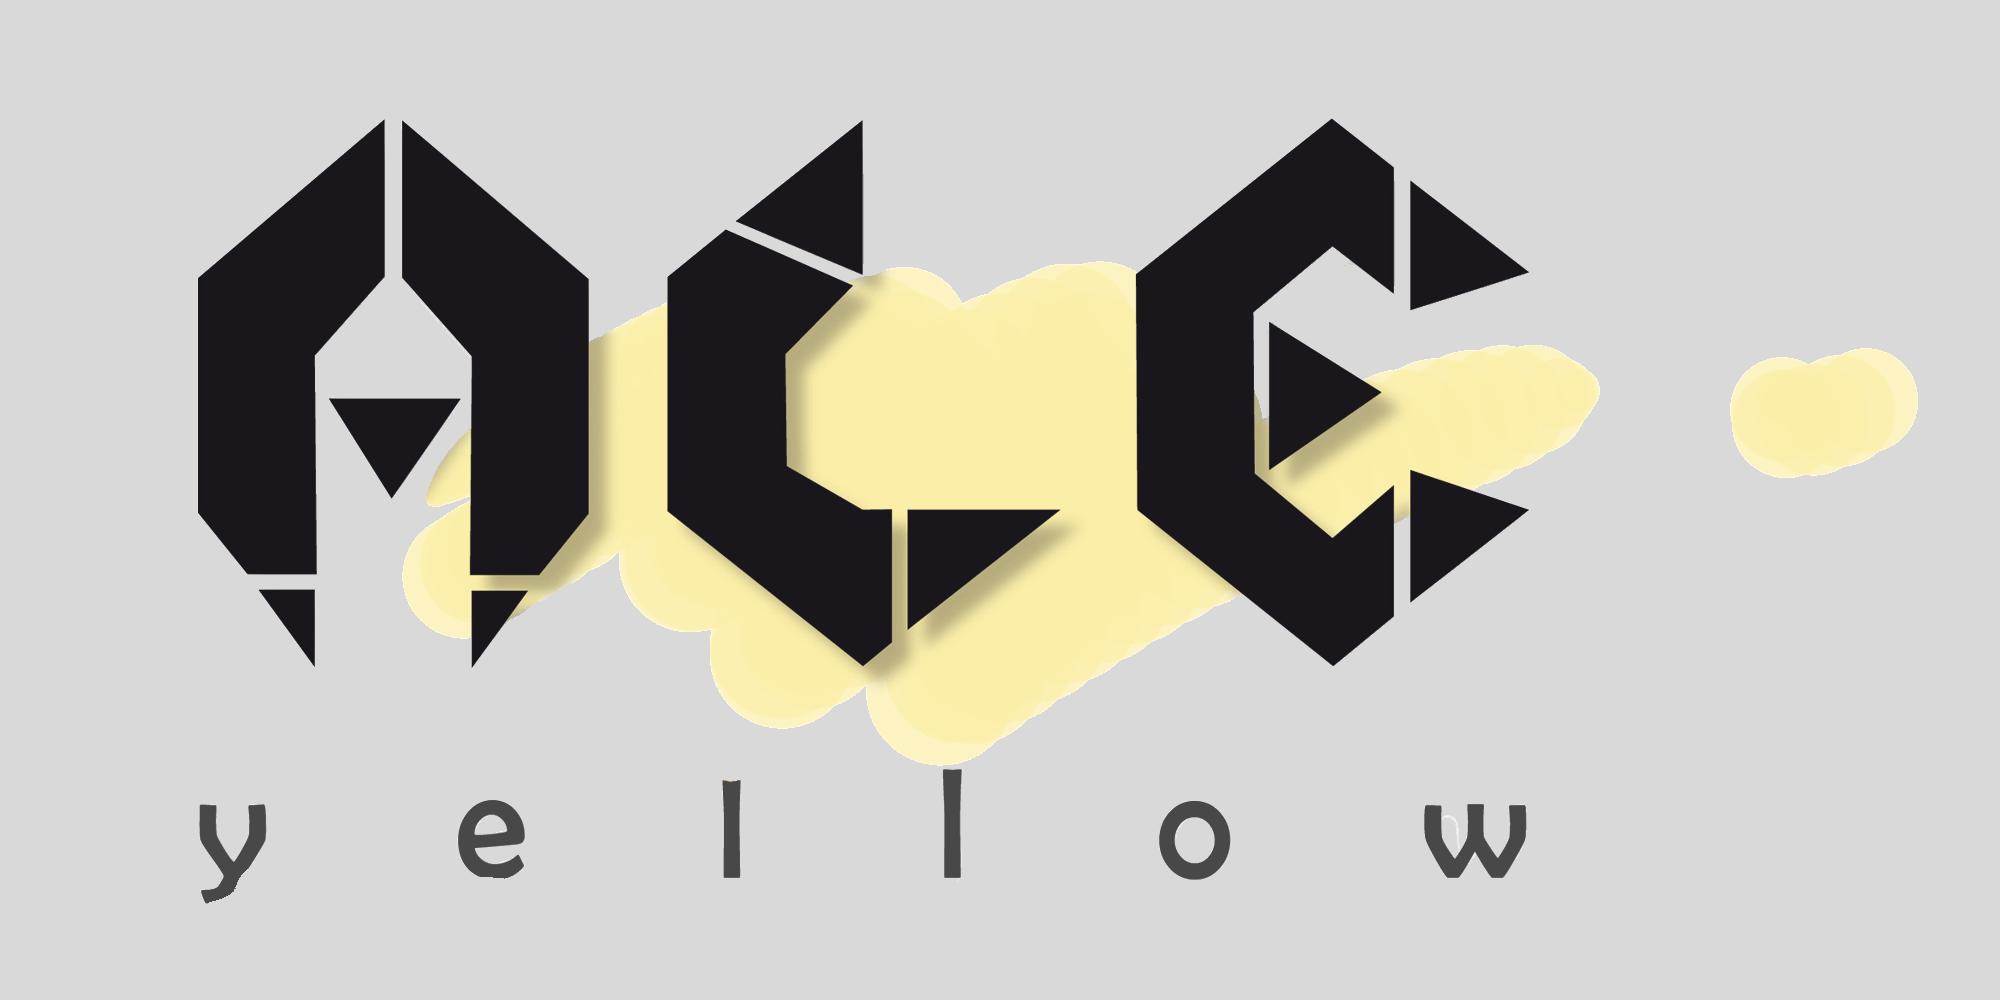 aleyellow logo